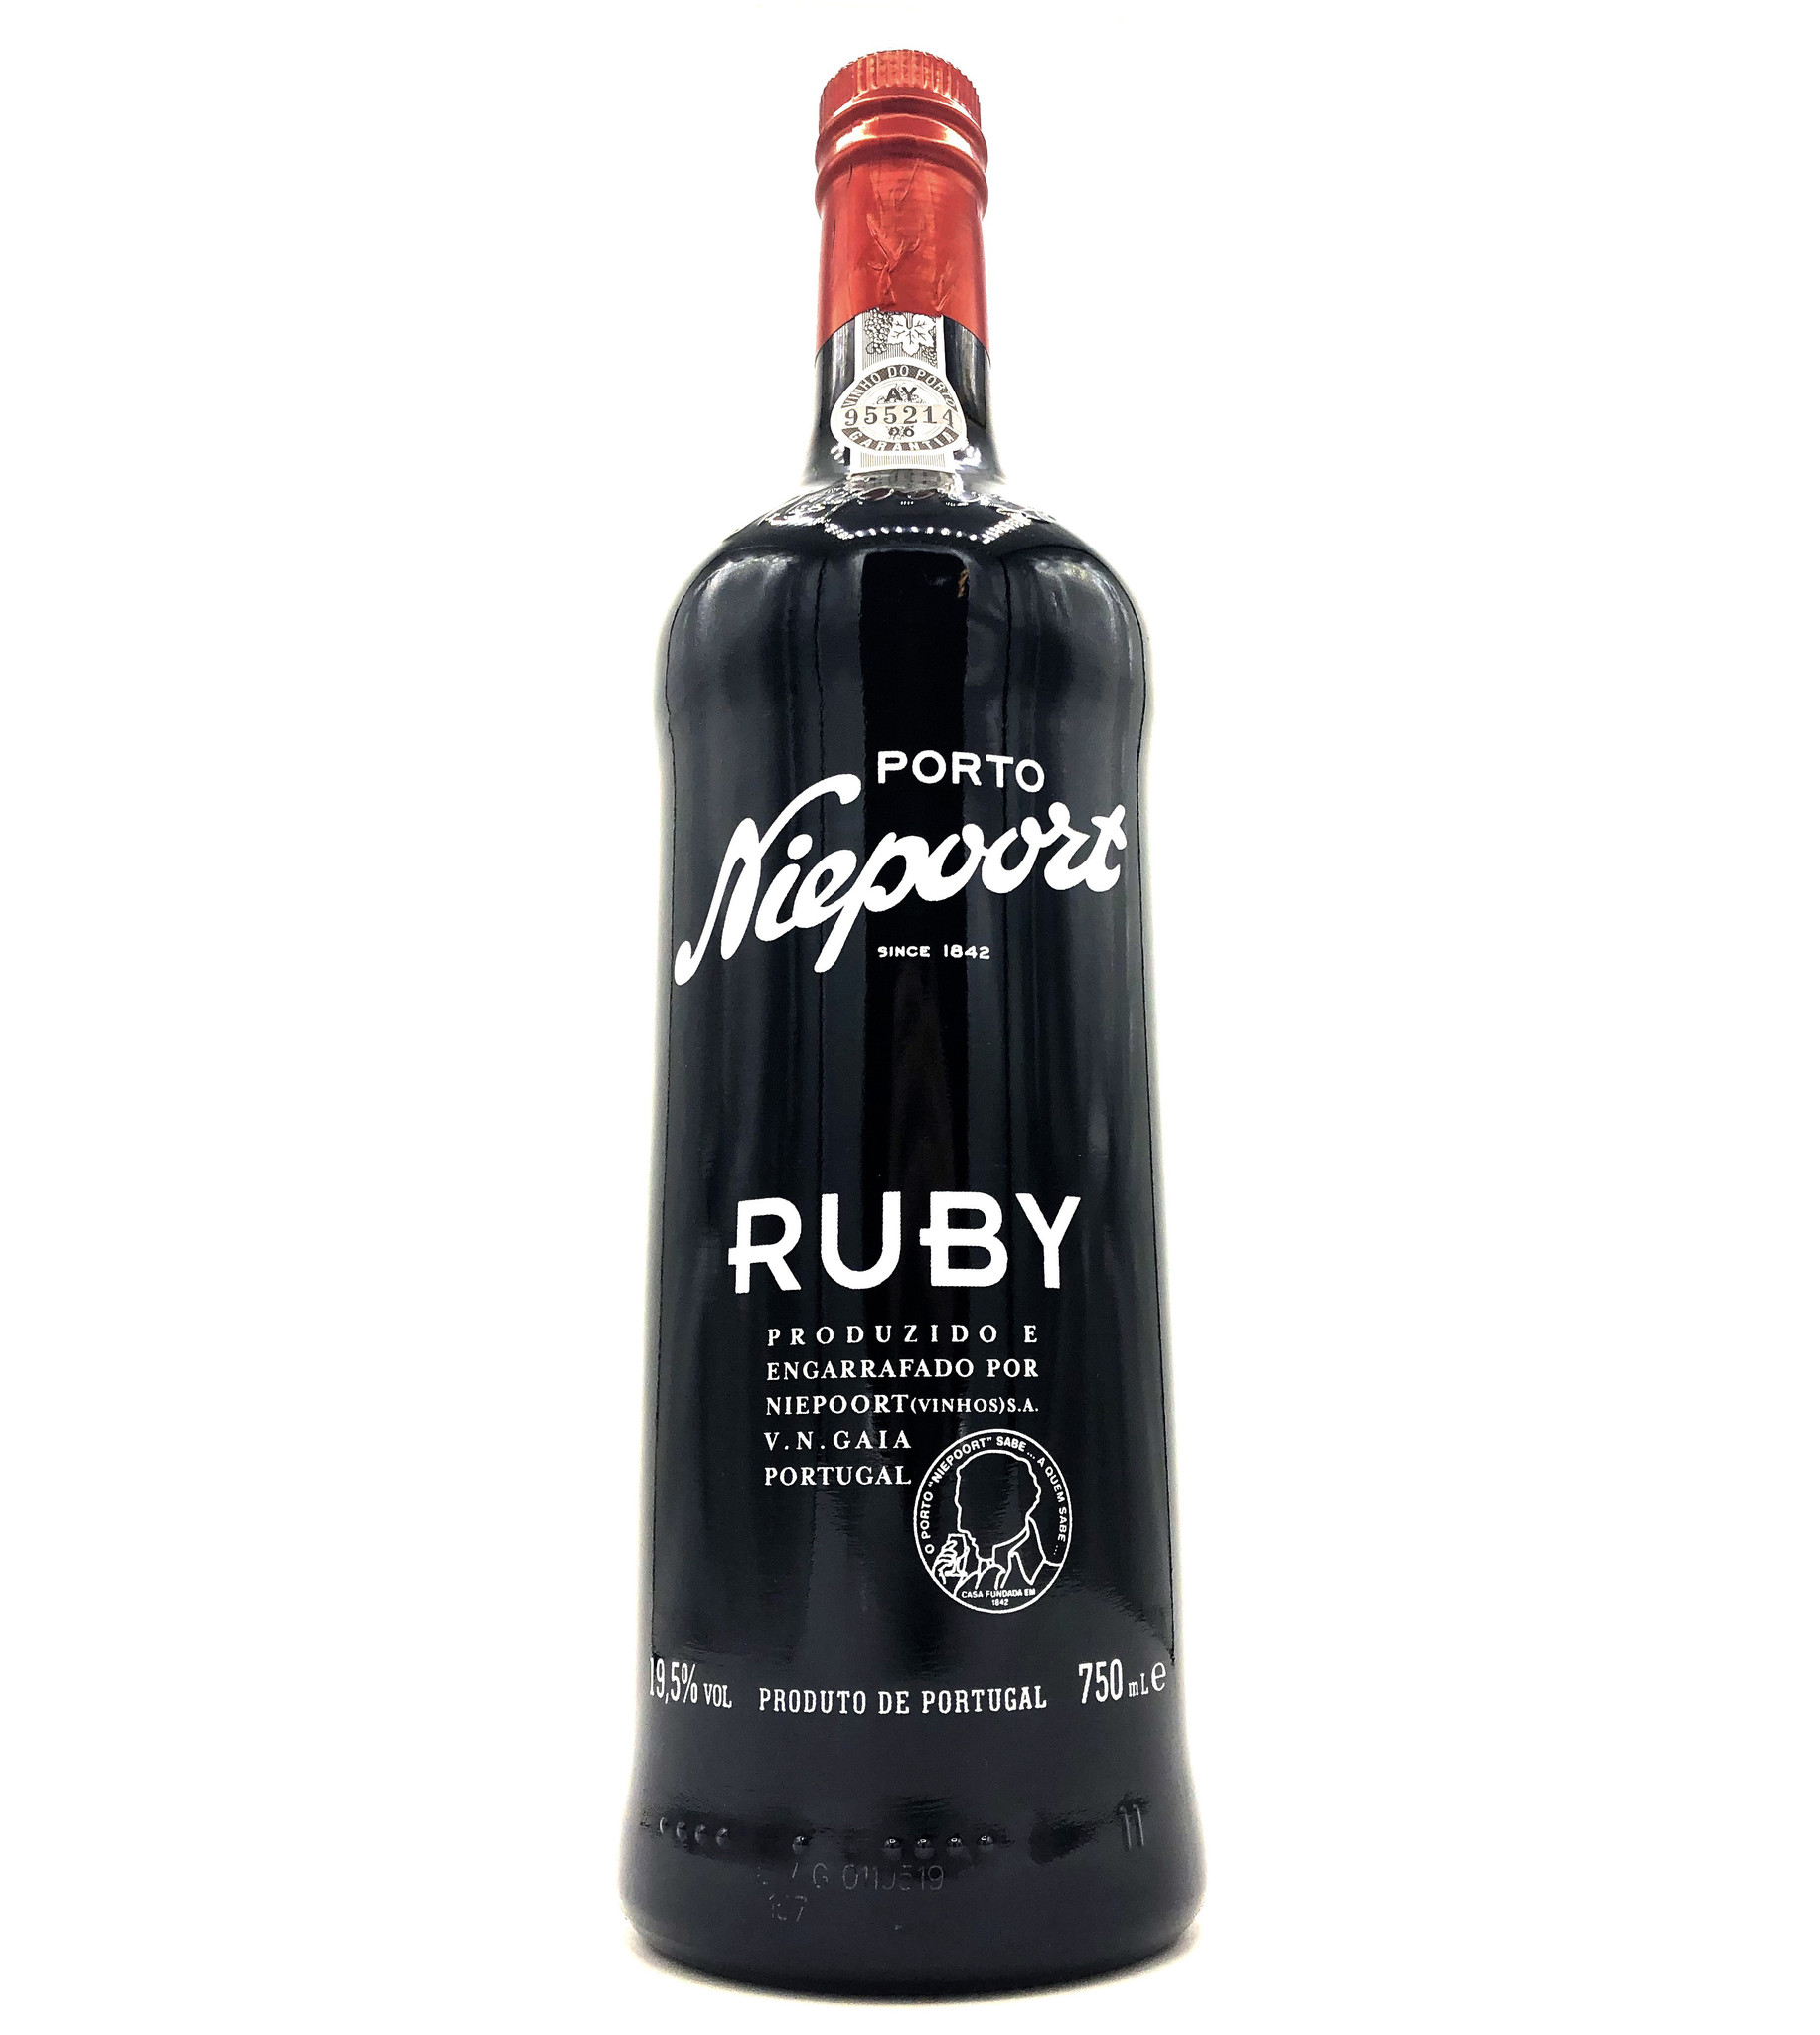 Ruby Port NV 750mL Niepoort